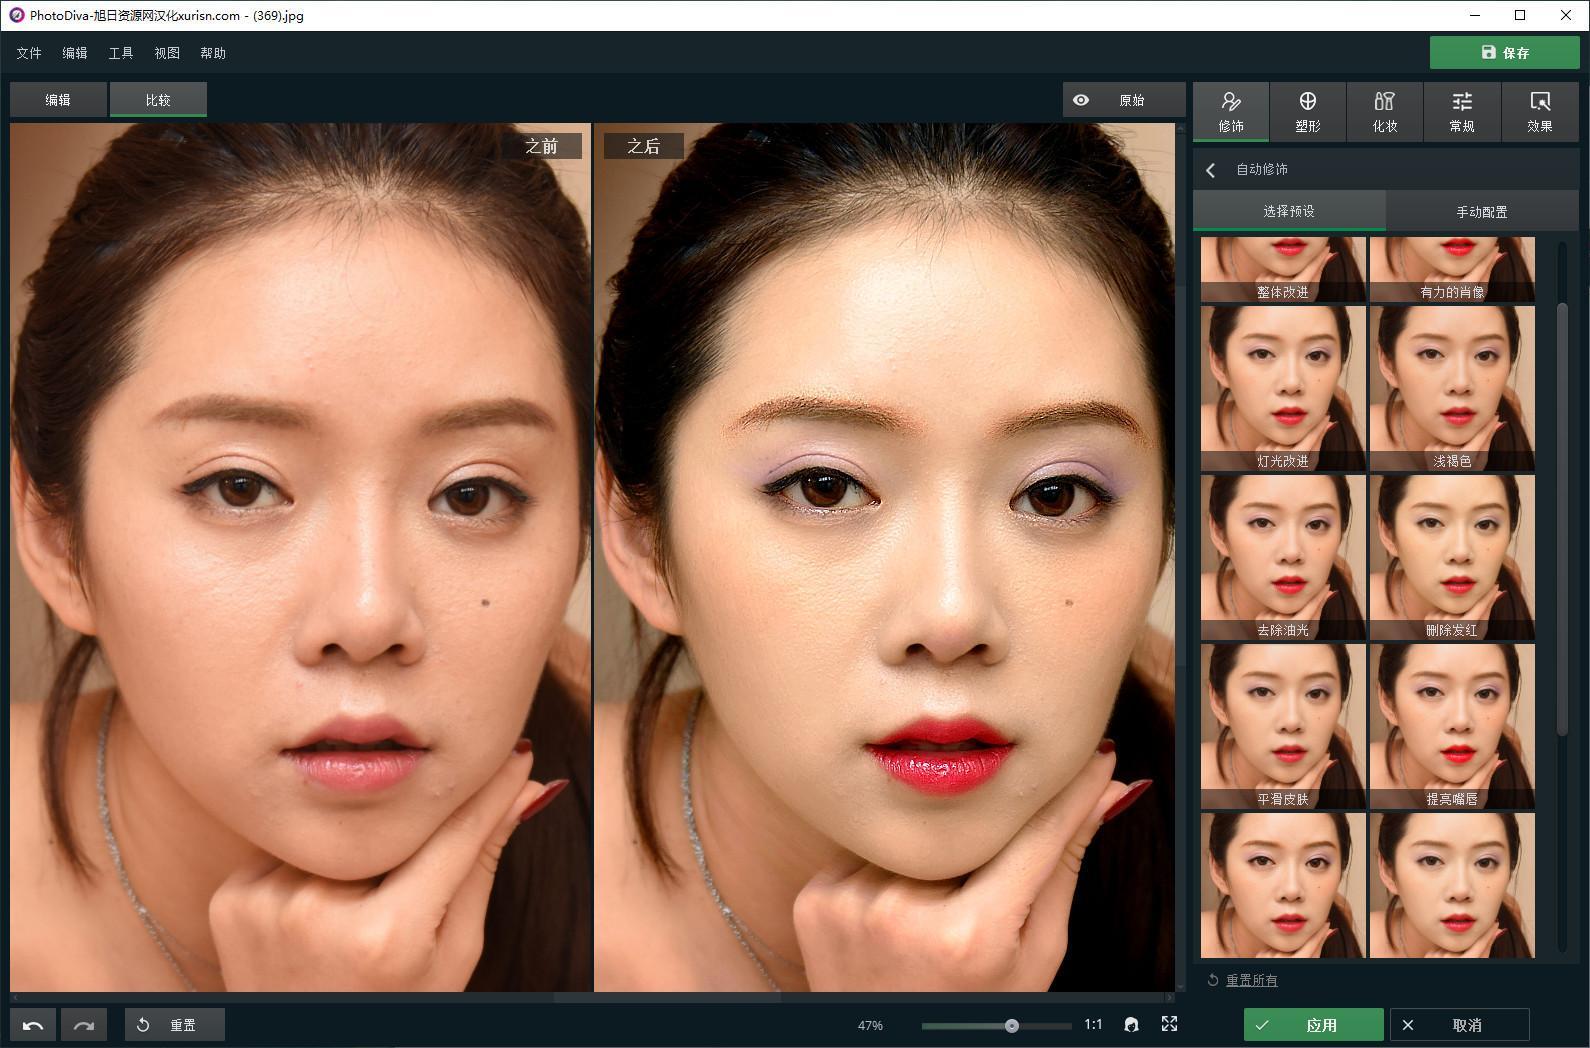 VIP资源-PhotoDiva Pro 3.0汉化版 快捷人像美容塑形修肤化妆照片编辑器(6)